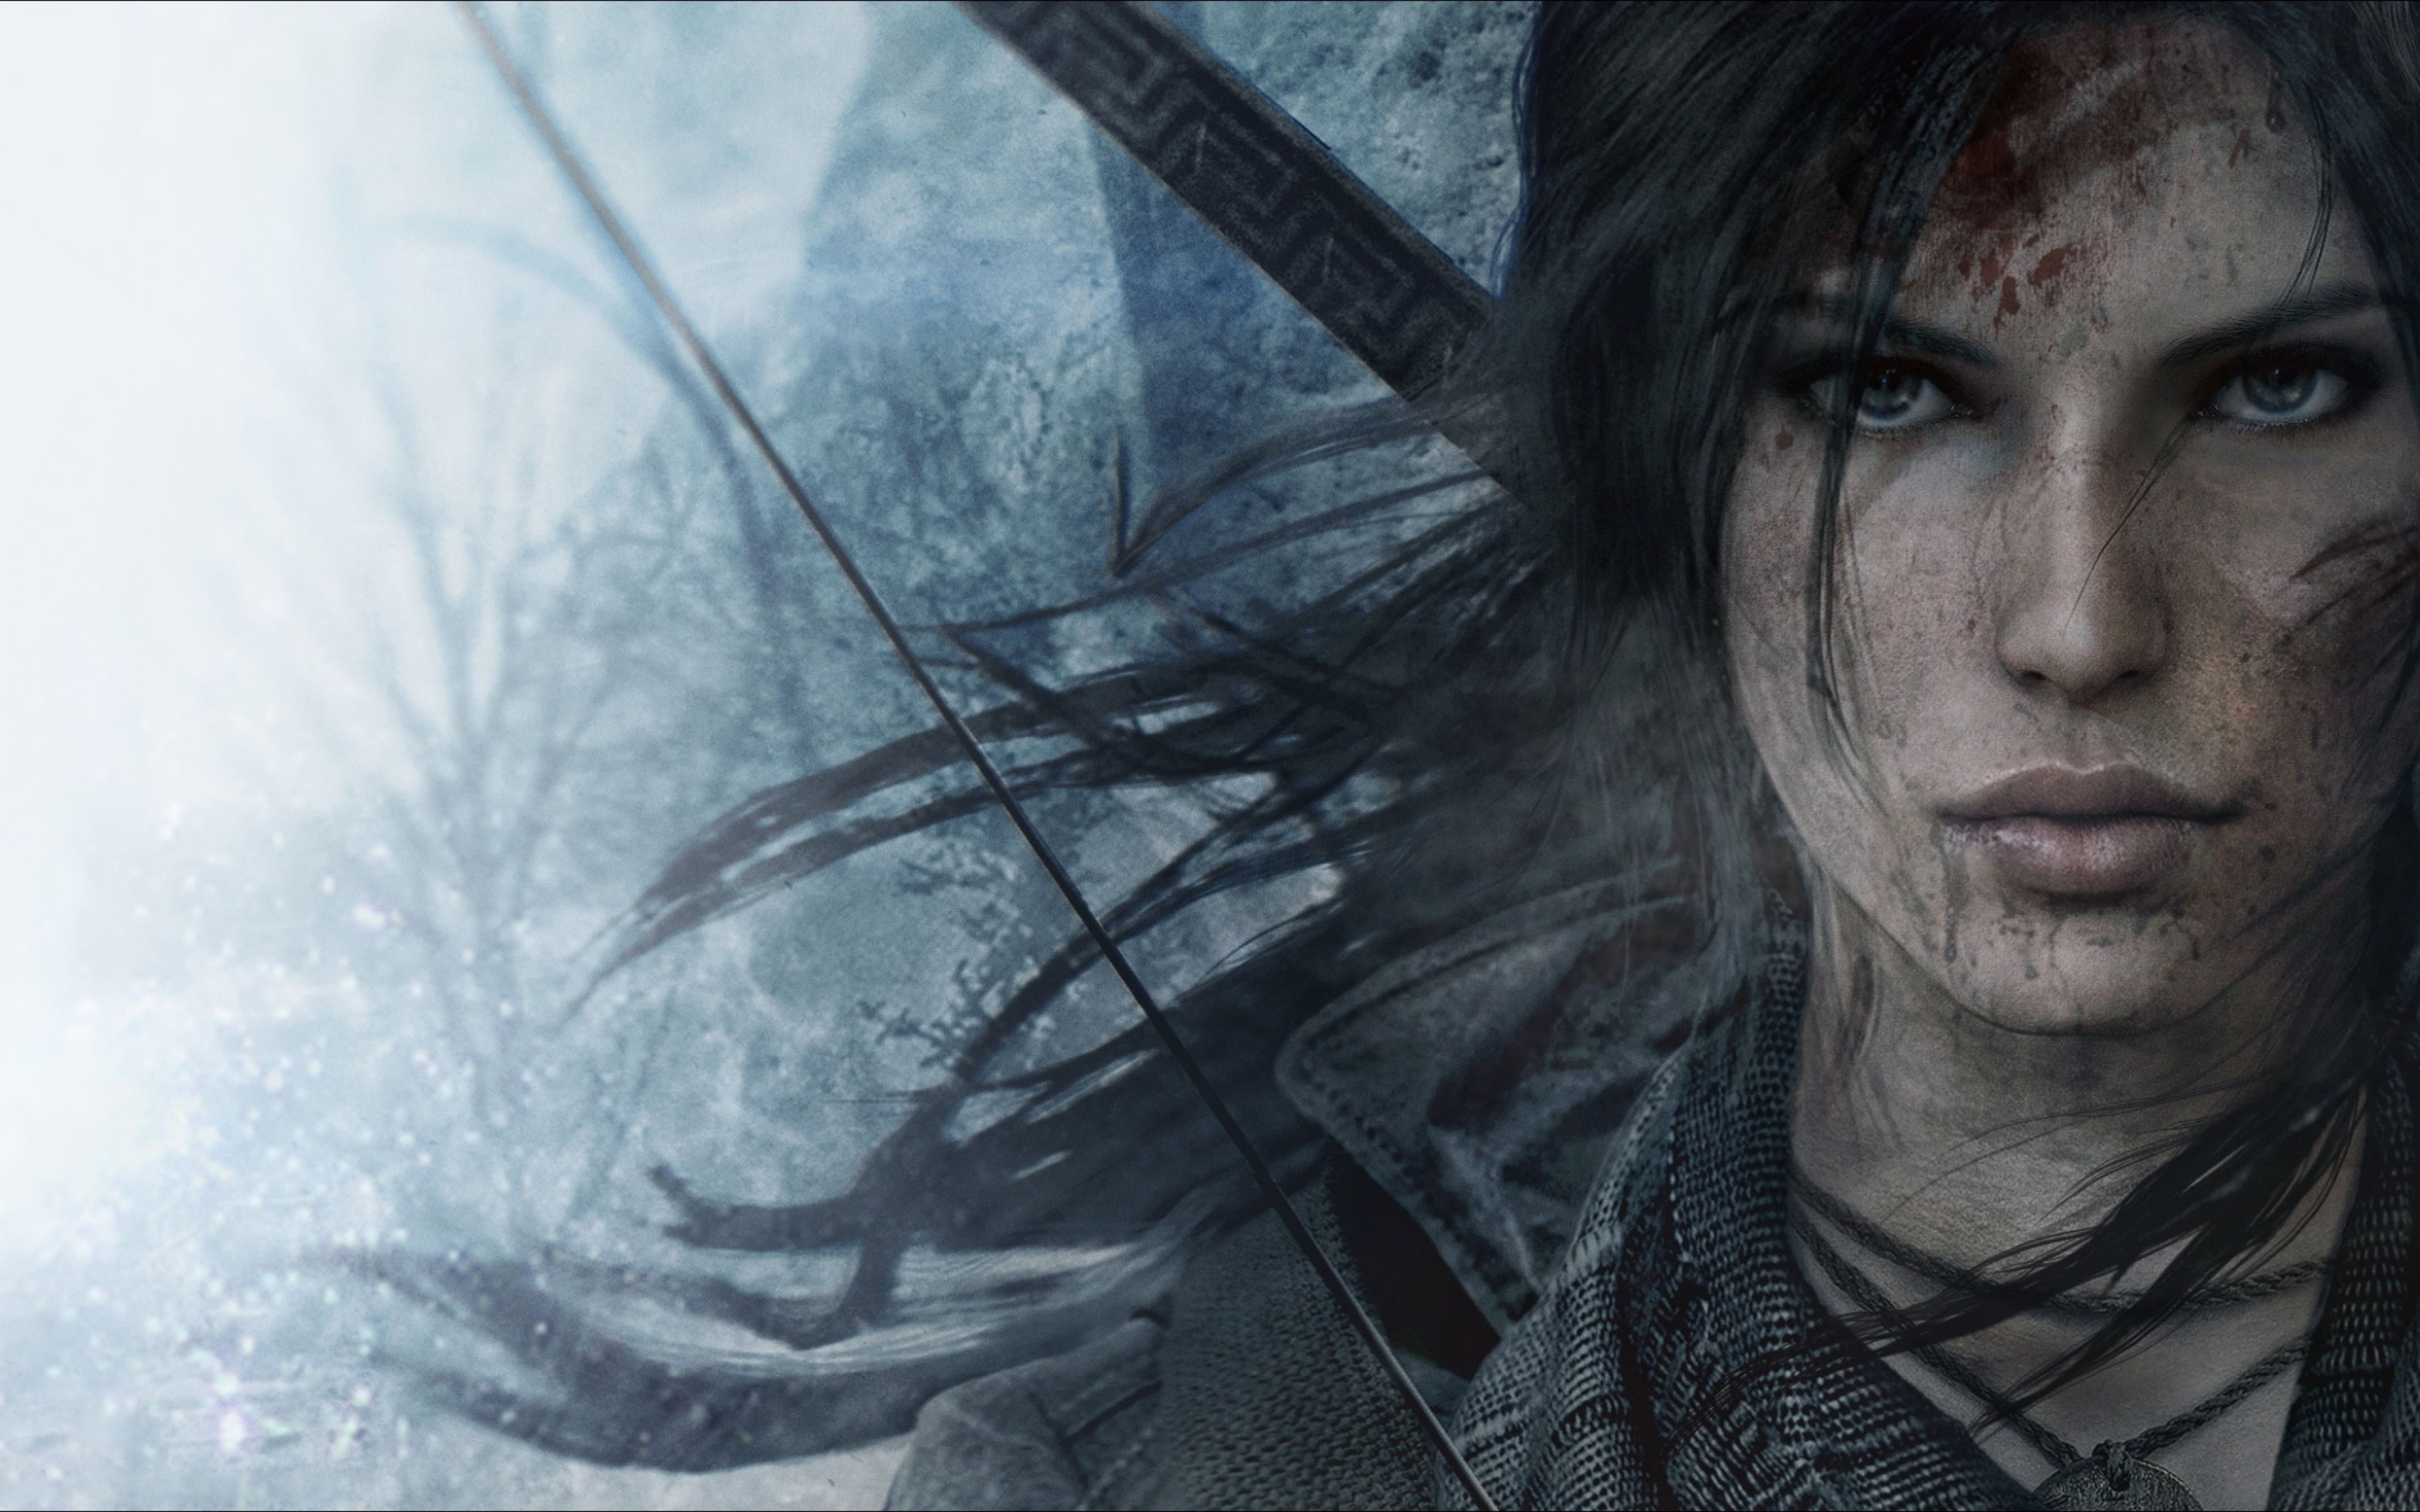 Ultra Hd K Lara Croft Wallpapers Hd Desktop Backgrounds Tomb Raider Wallpaper Tomb Raider Game Tomb Raider Reboot